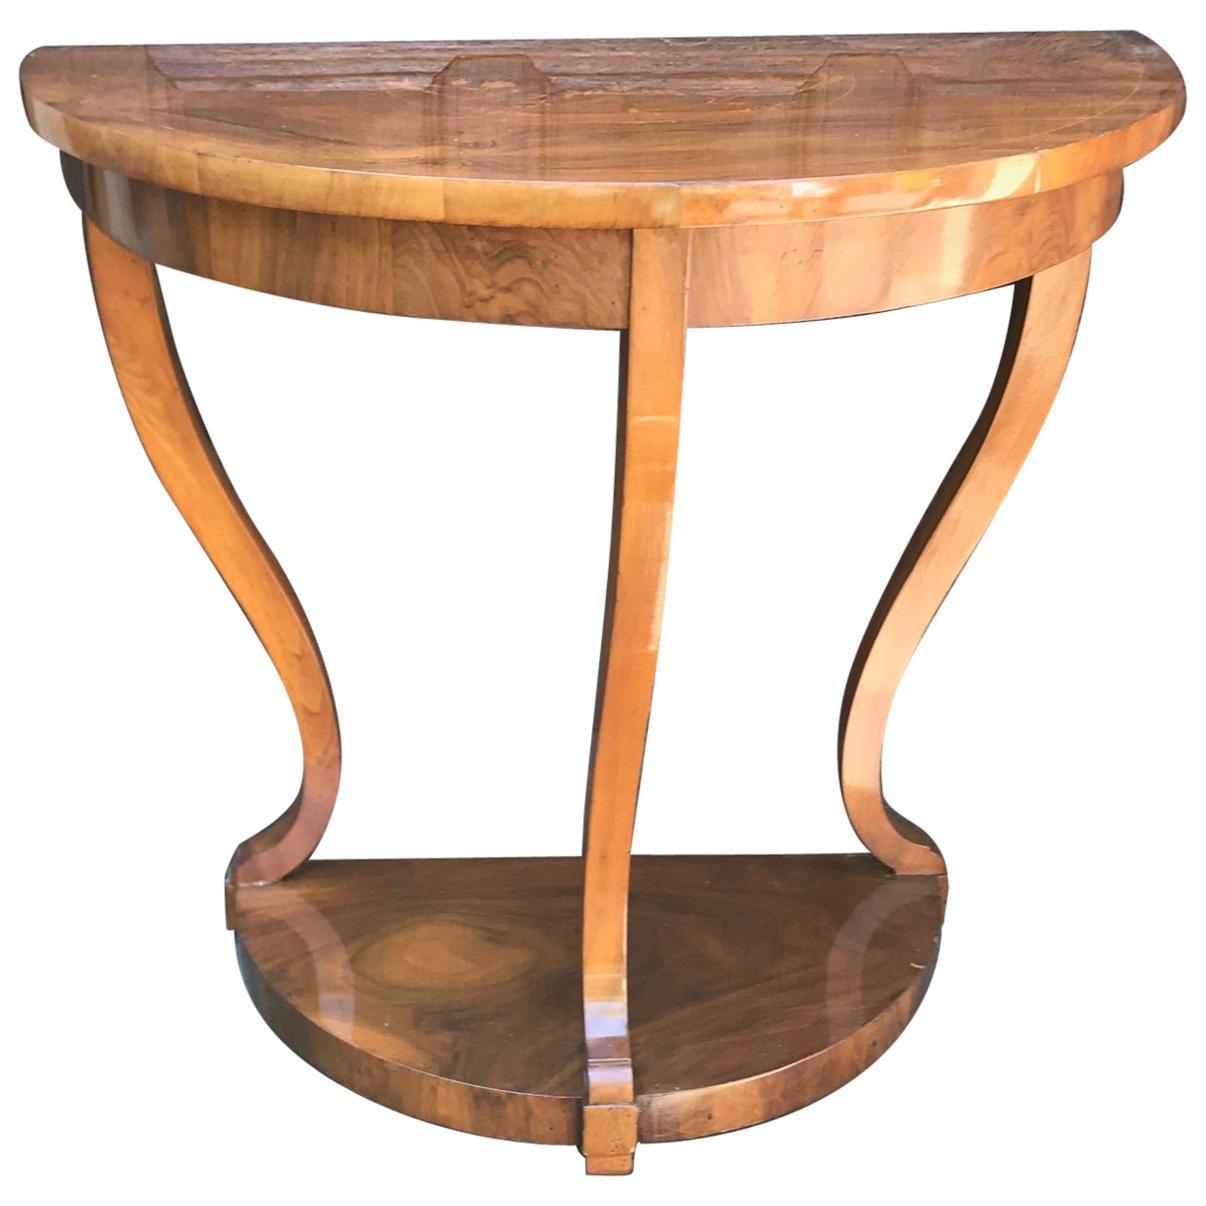 Biedermeier Console Table, Walnut Veneer, South German, 1820